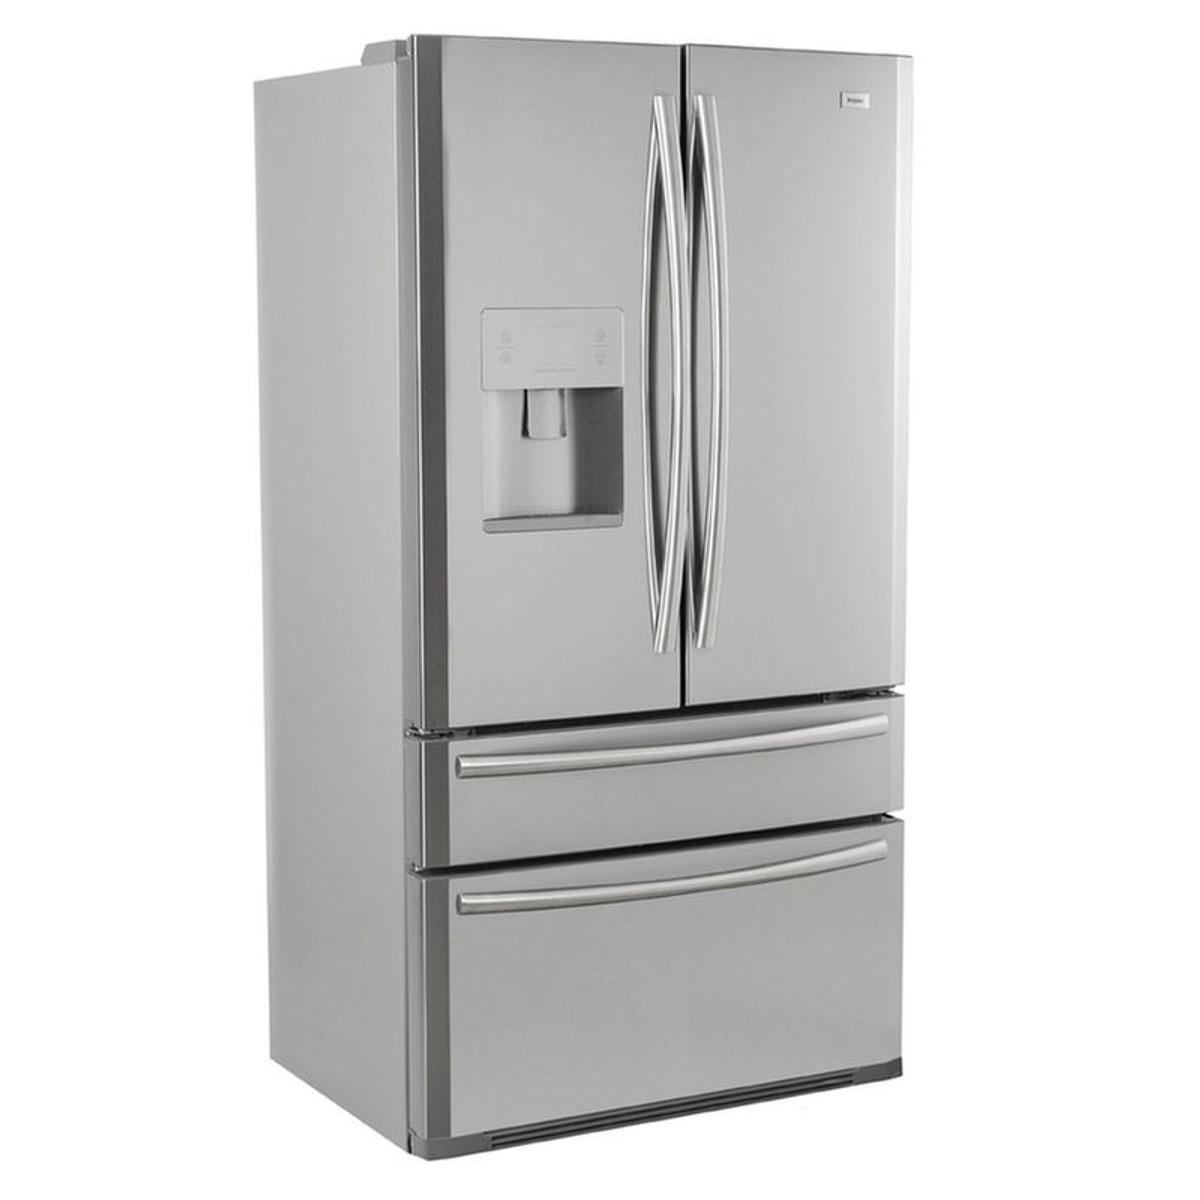 Refrigerateur Americain Hb22fwrssaa Taille Tu Refrigerateur Americain Frigo Americain Refrigerateur